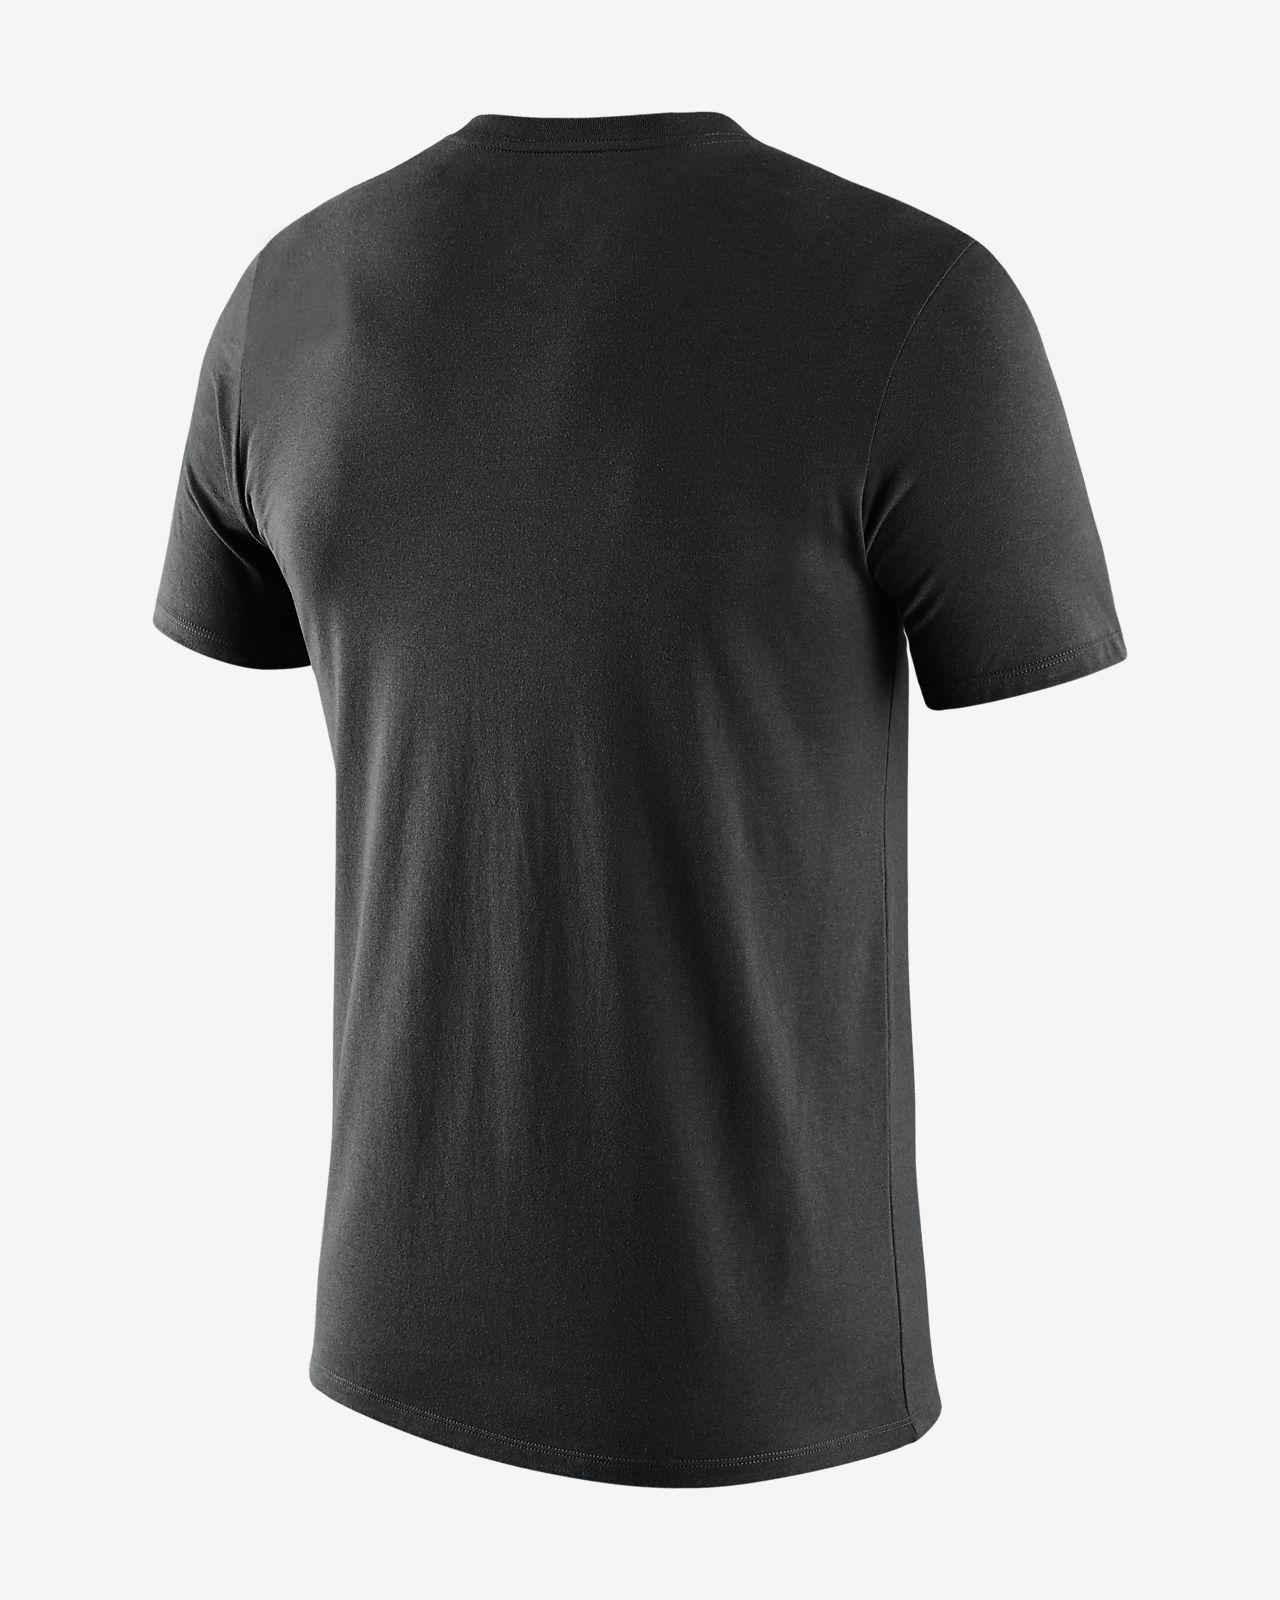 new arrival bd383 908c6 Miami Heat Nike Dri-FIT Men's NBA T-Shirt